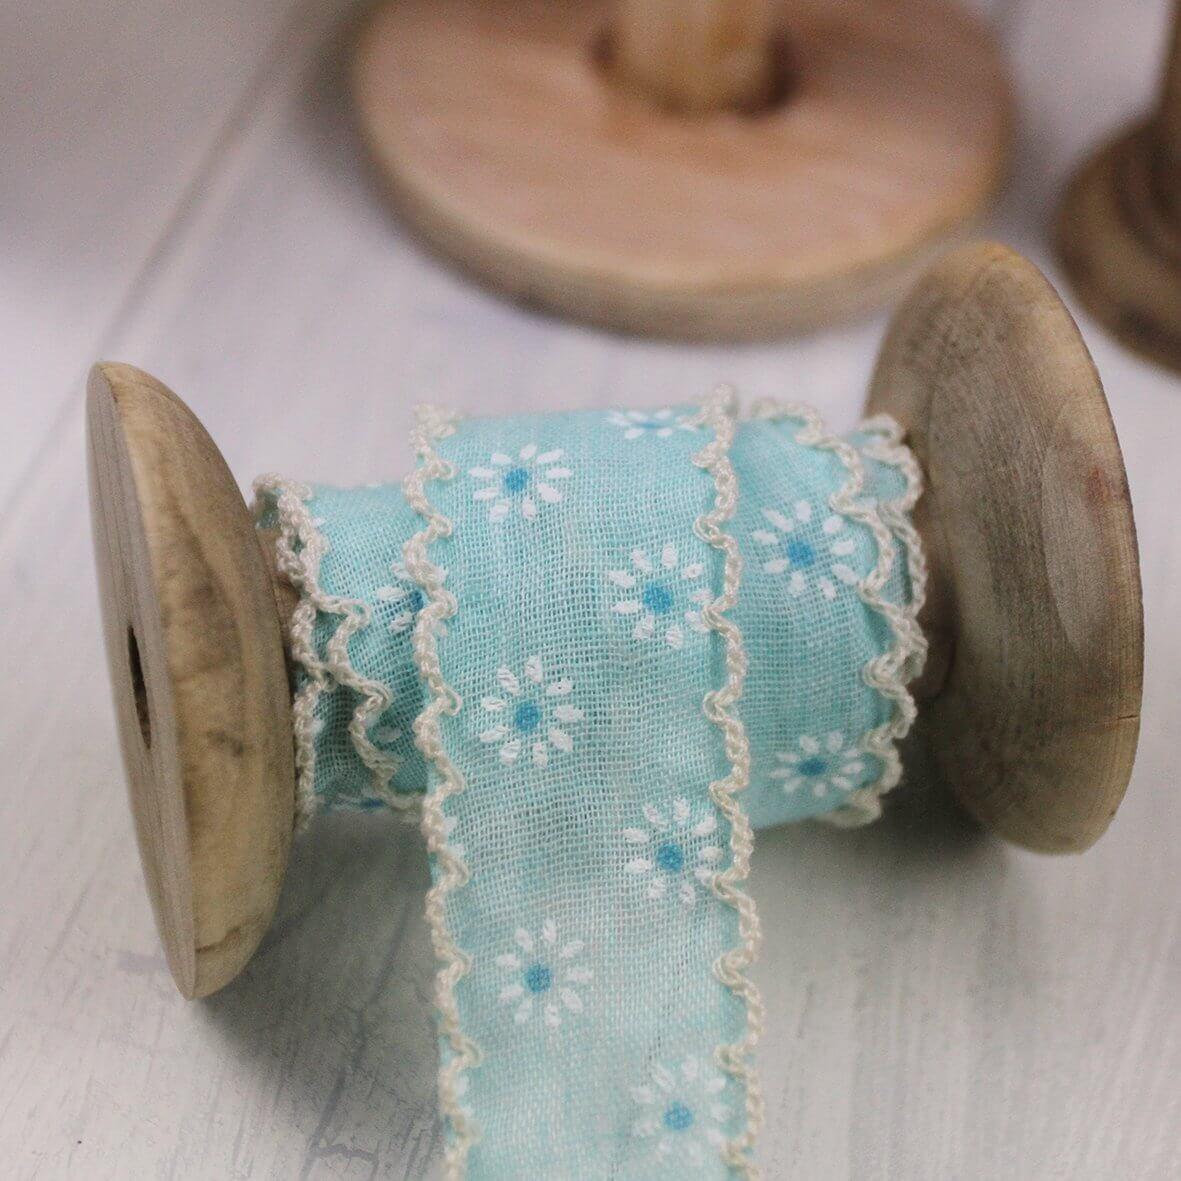 Vintage Daisy Lace Edge Ribbon 25mm - Turquoise